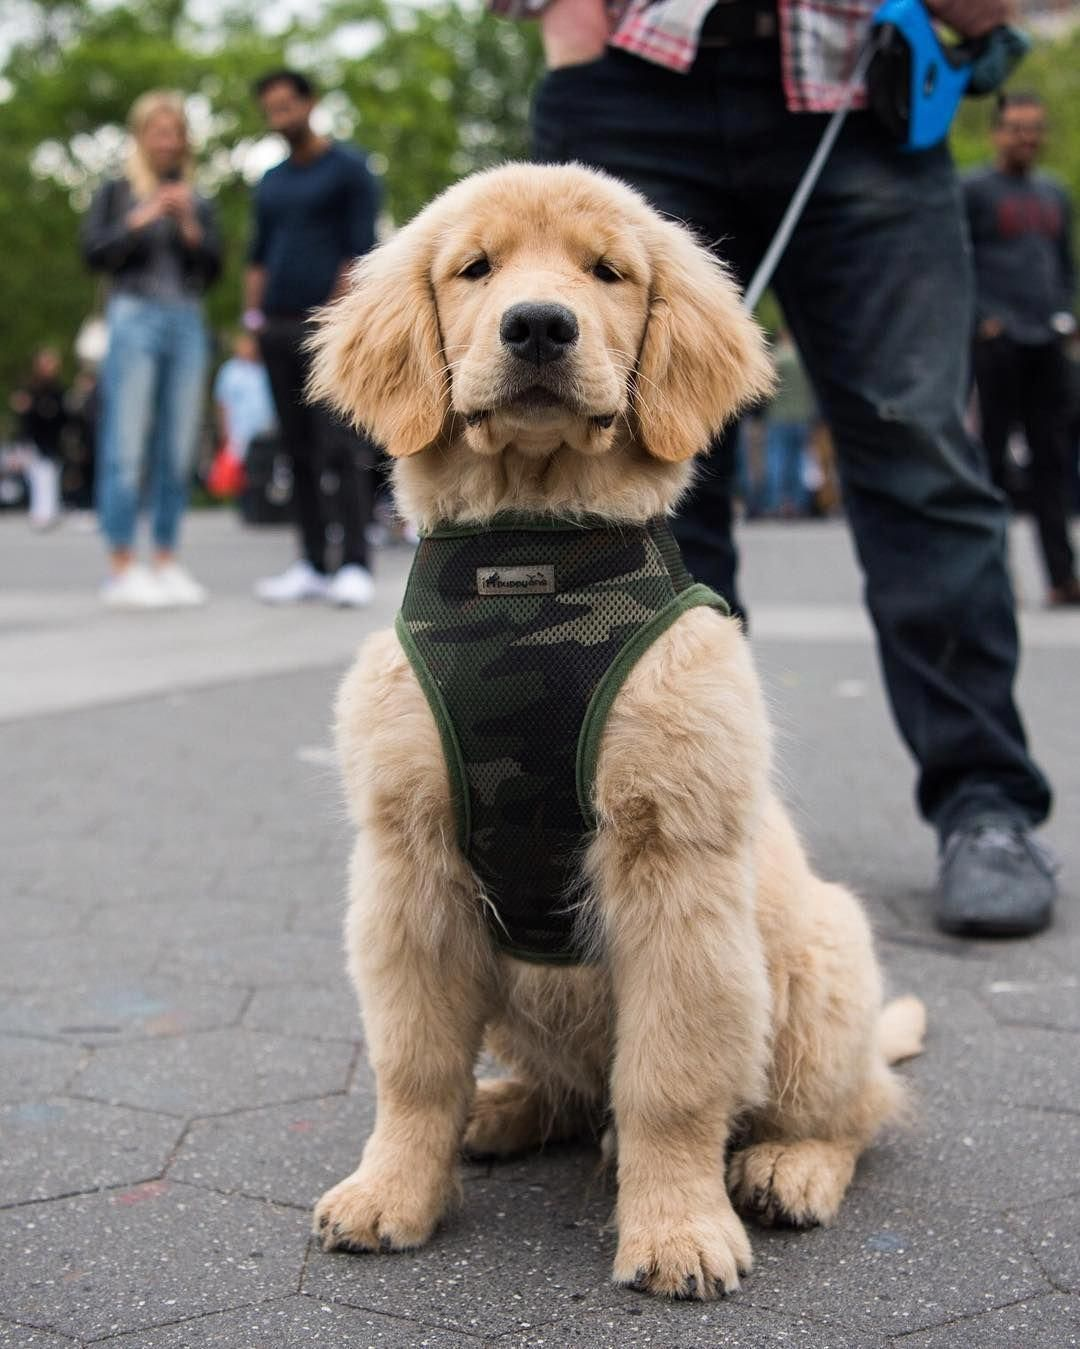 Major Golden Retriever 3 M O Washington Square Park New York Ny